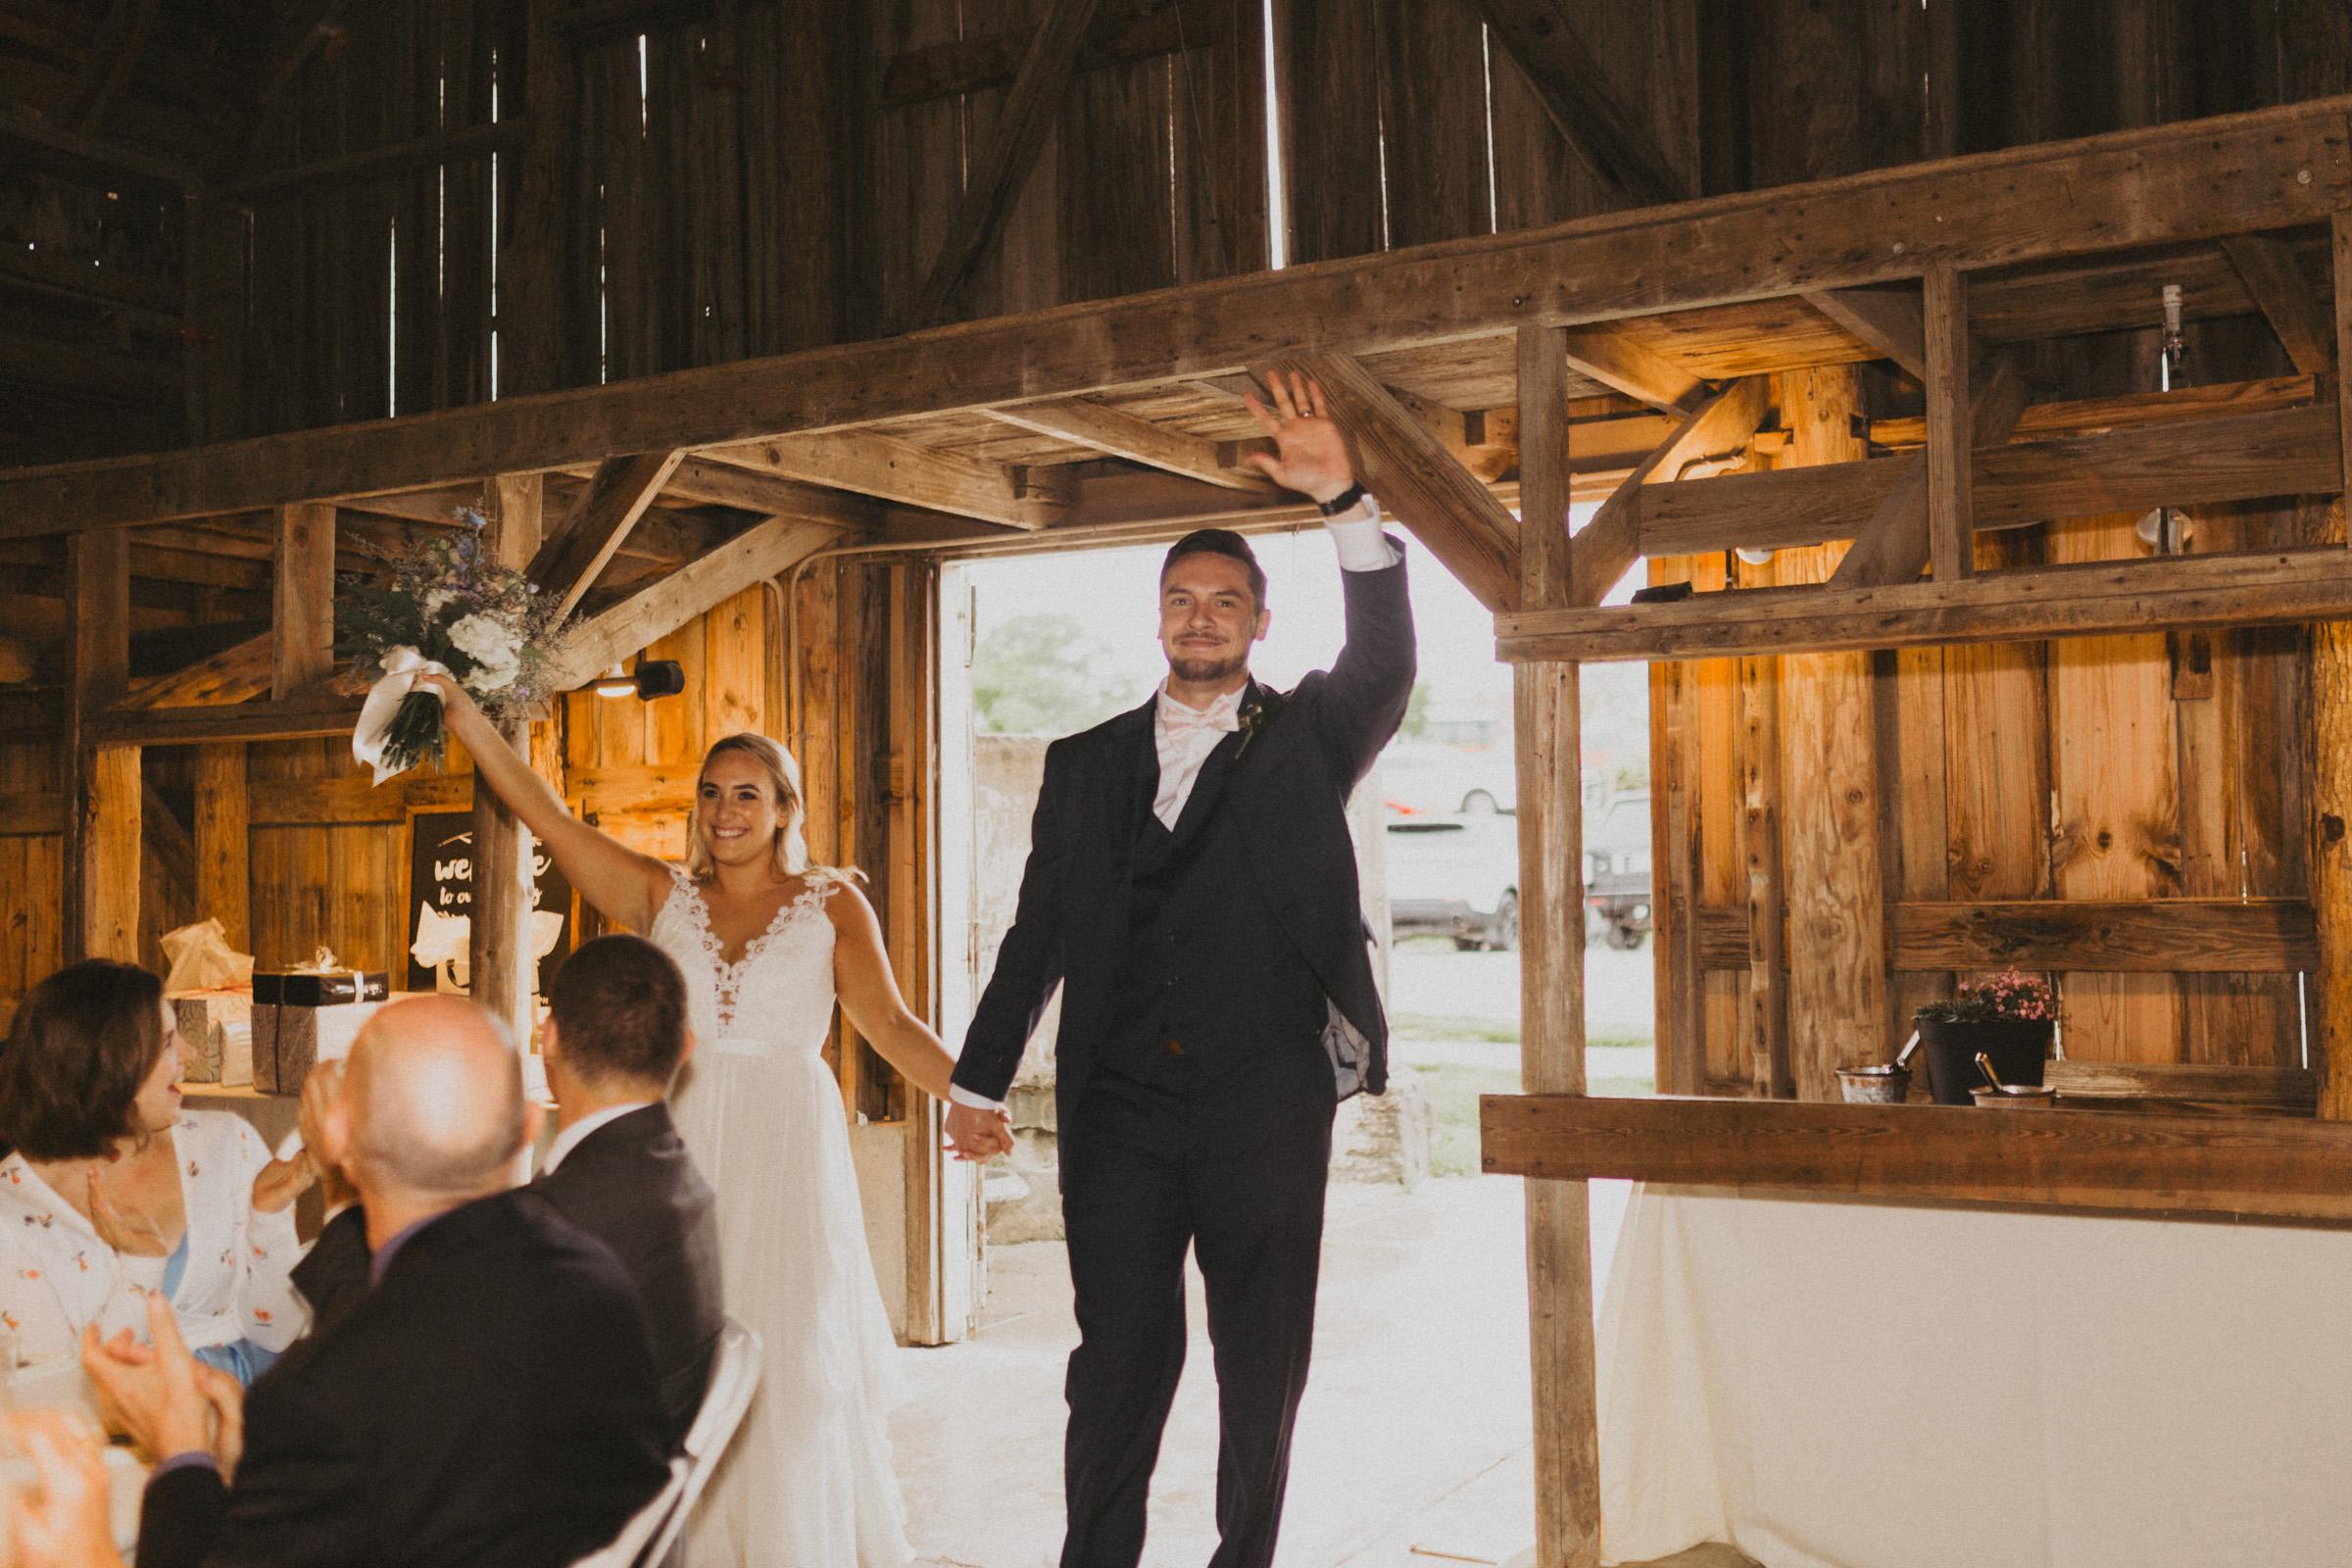 alyssa barletter photography nelson wedding nebraska city lied lodge morton barn spring wedding photographer-51.jpg